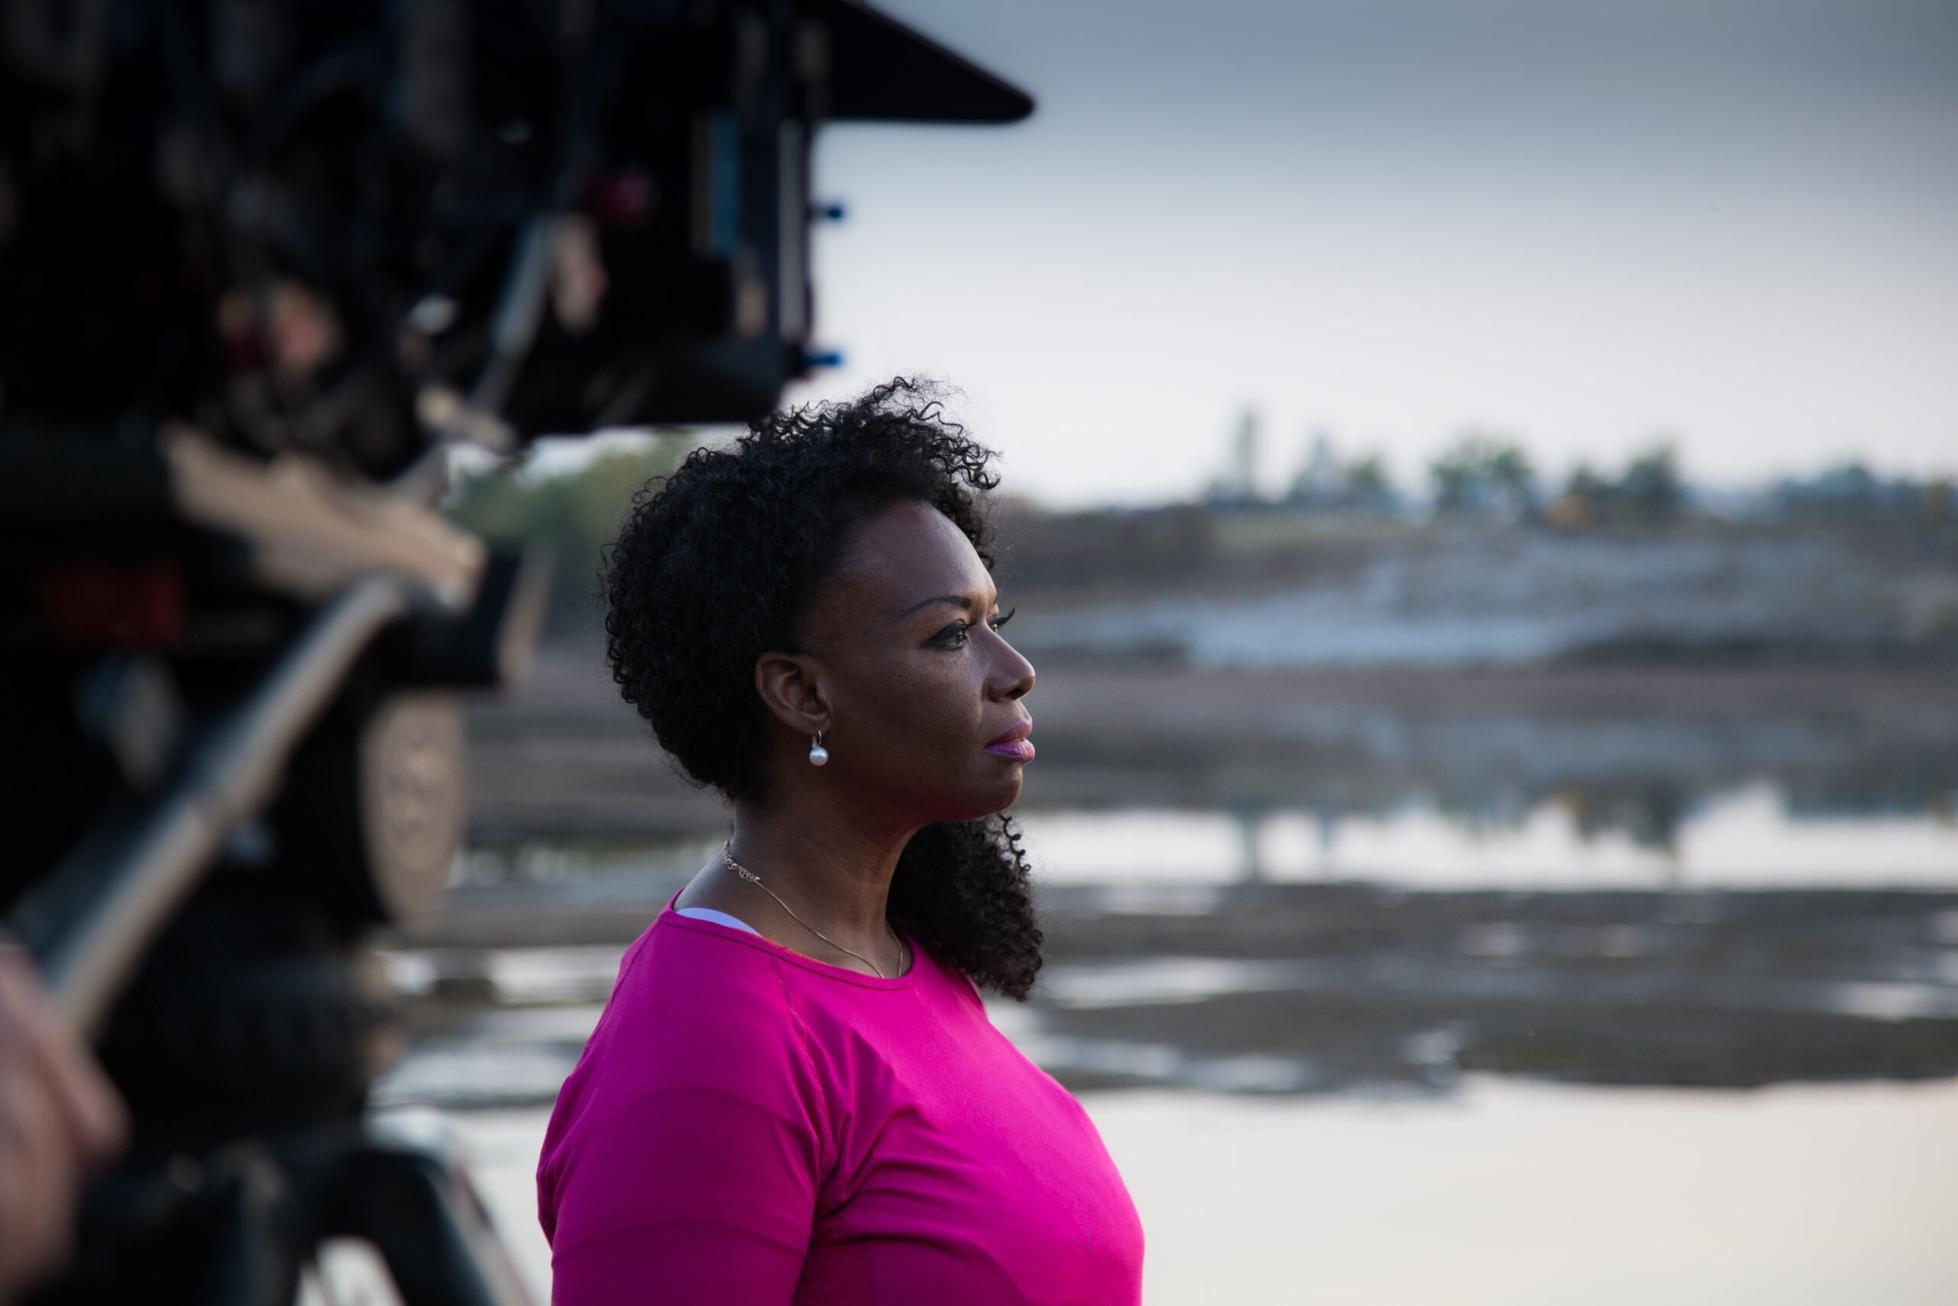 Washington Post reporter DeNeen Brown